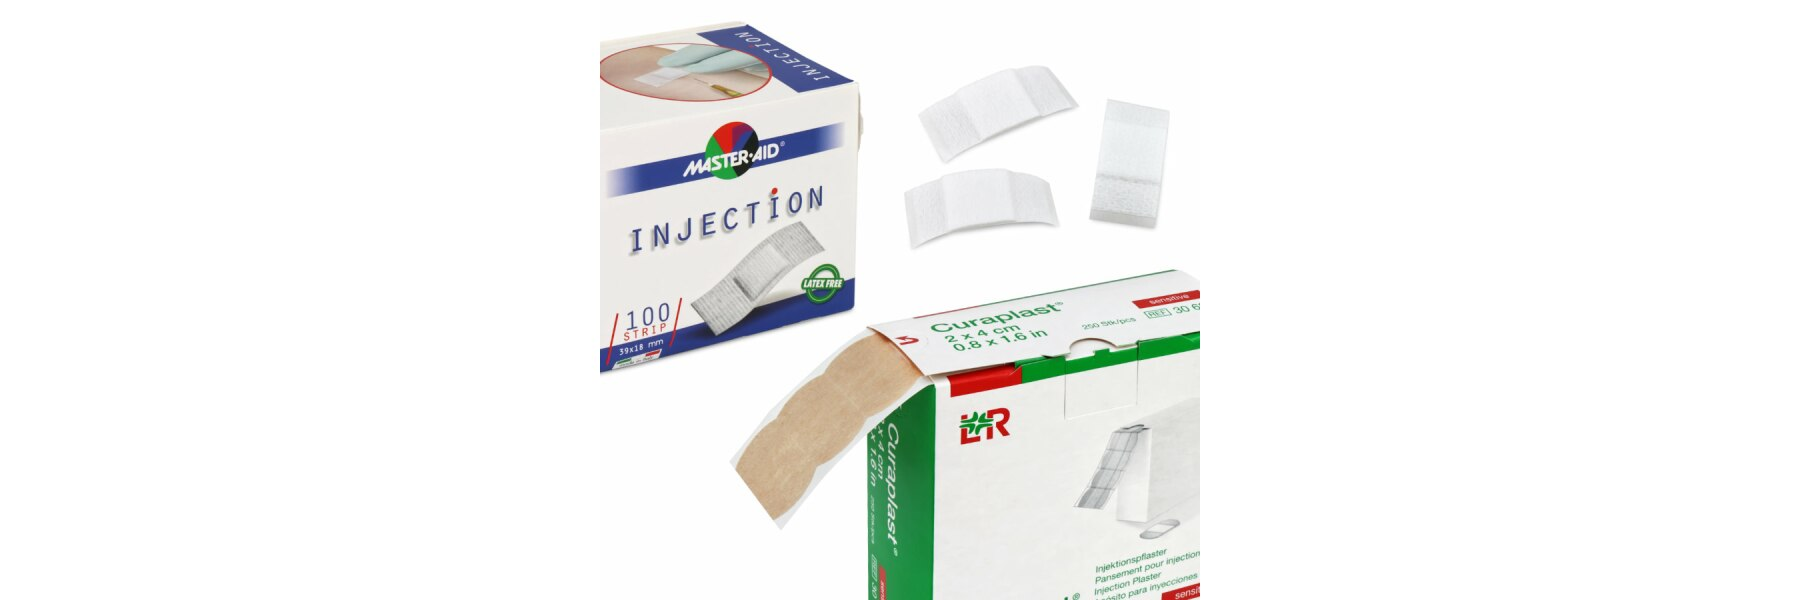 Injektionspflaster